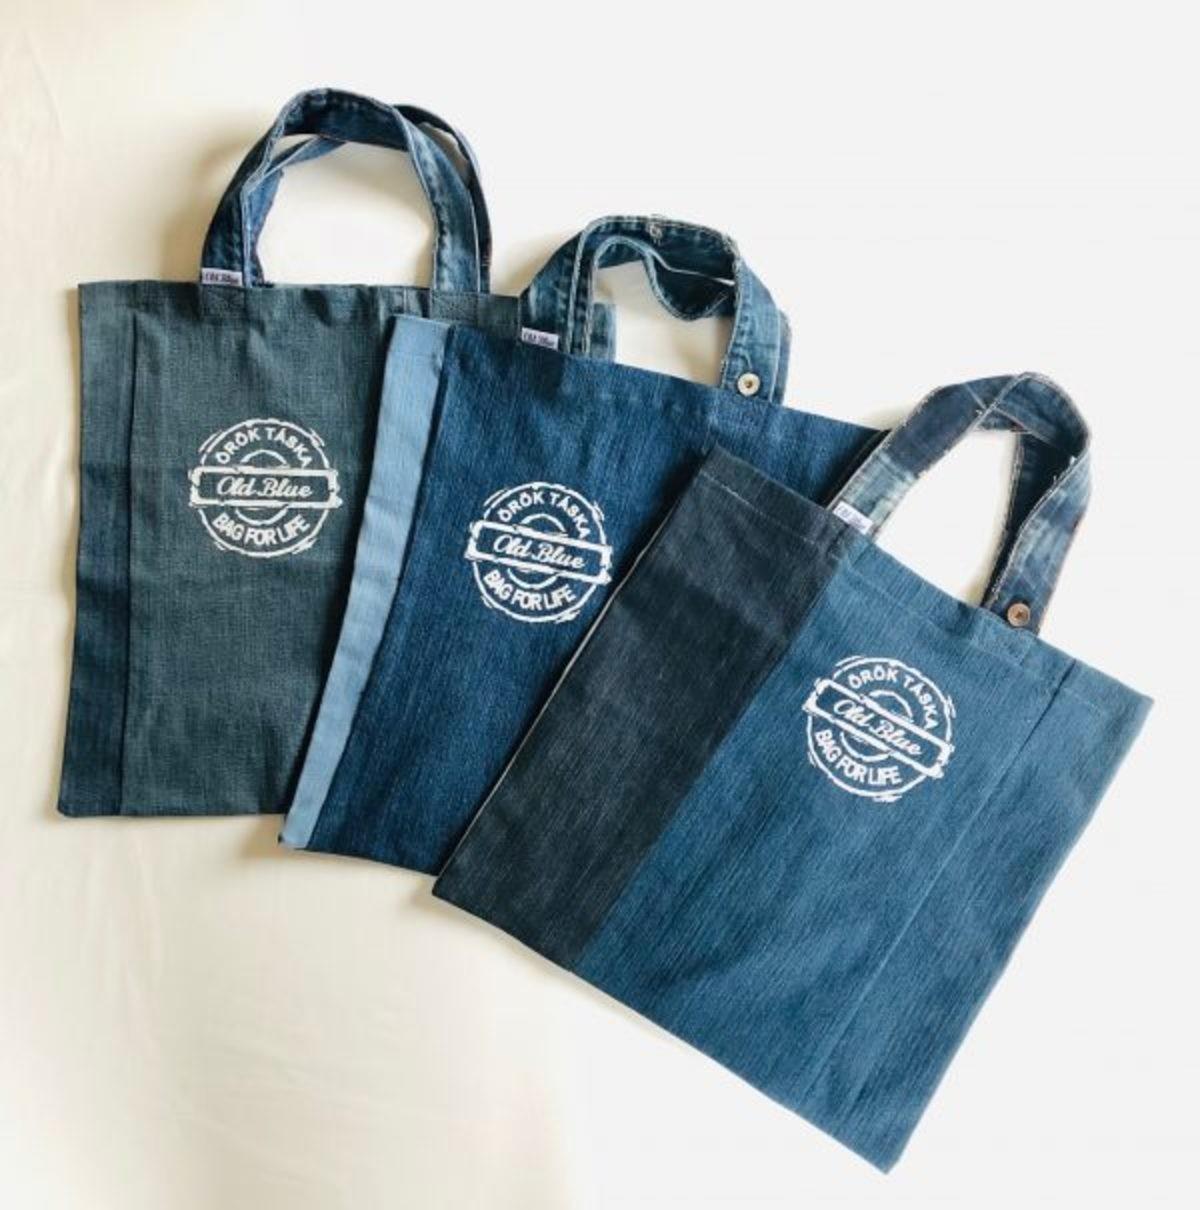 OldBlue bag for life2